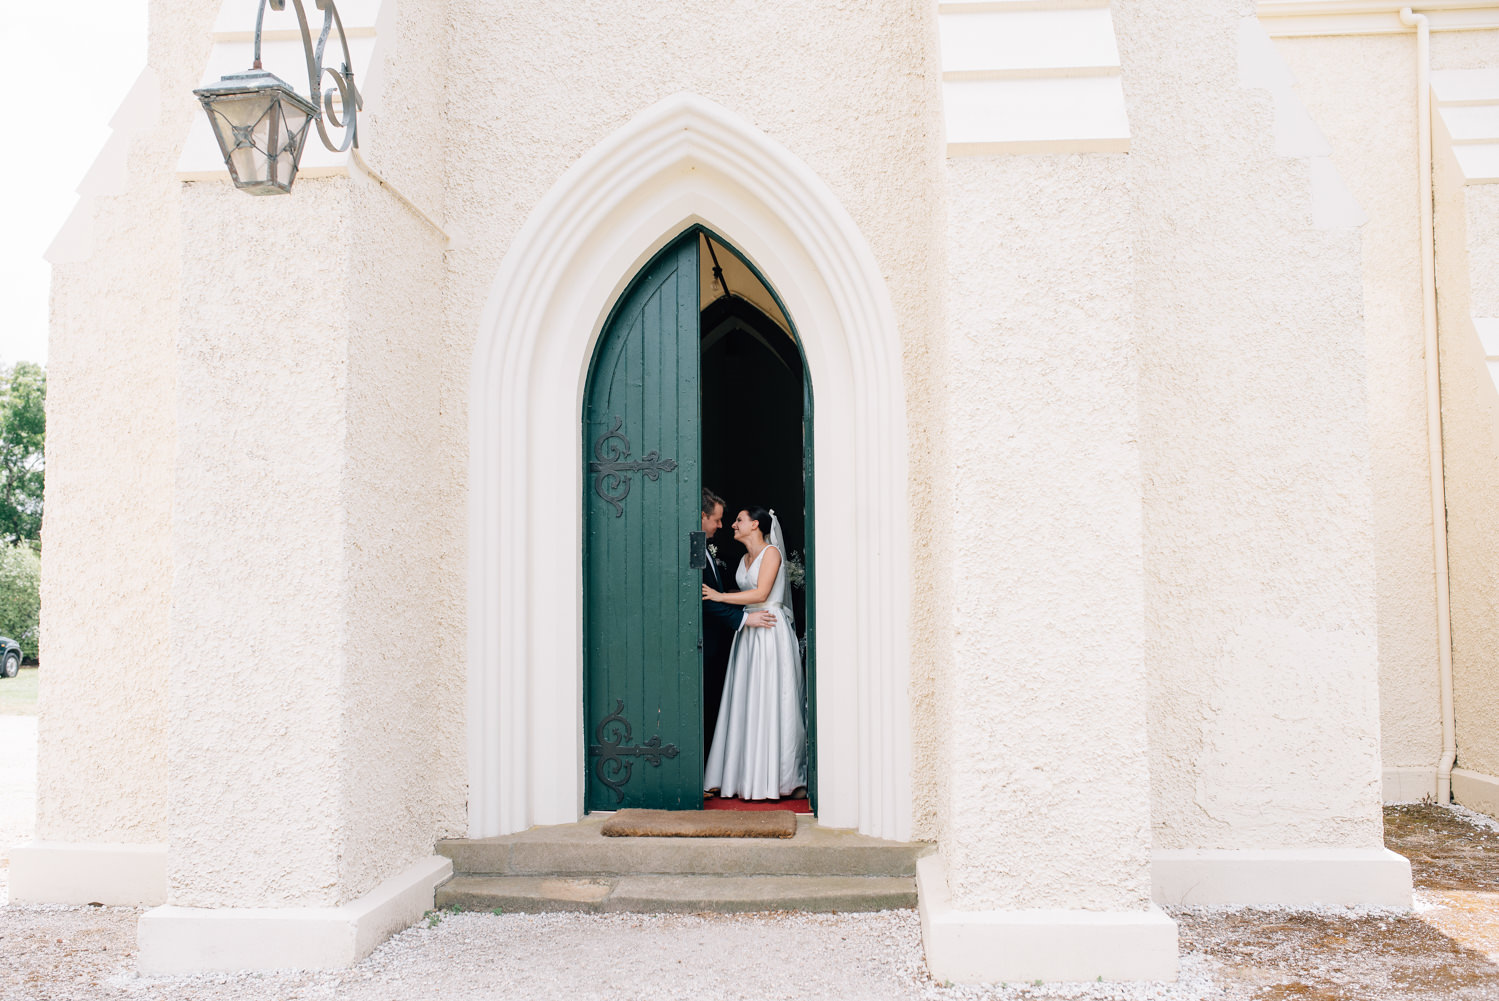 Josef-Chromy-Wedding-Photographer-37.jpg